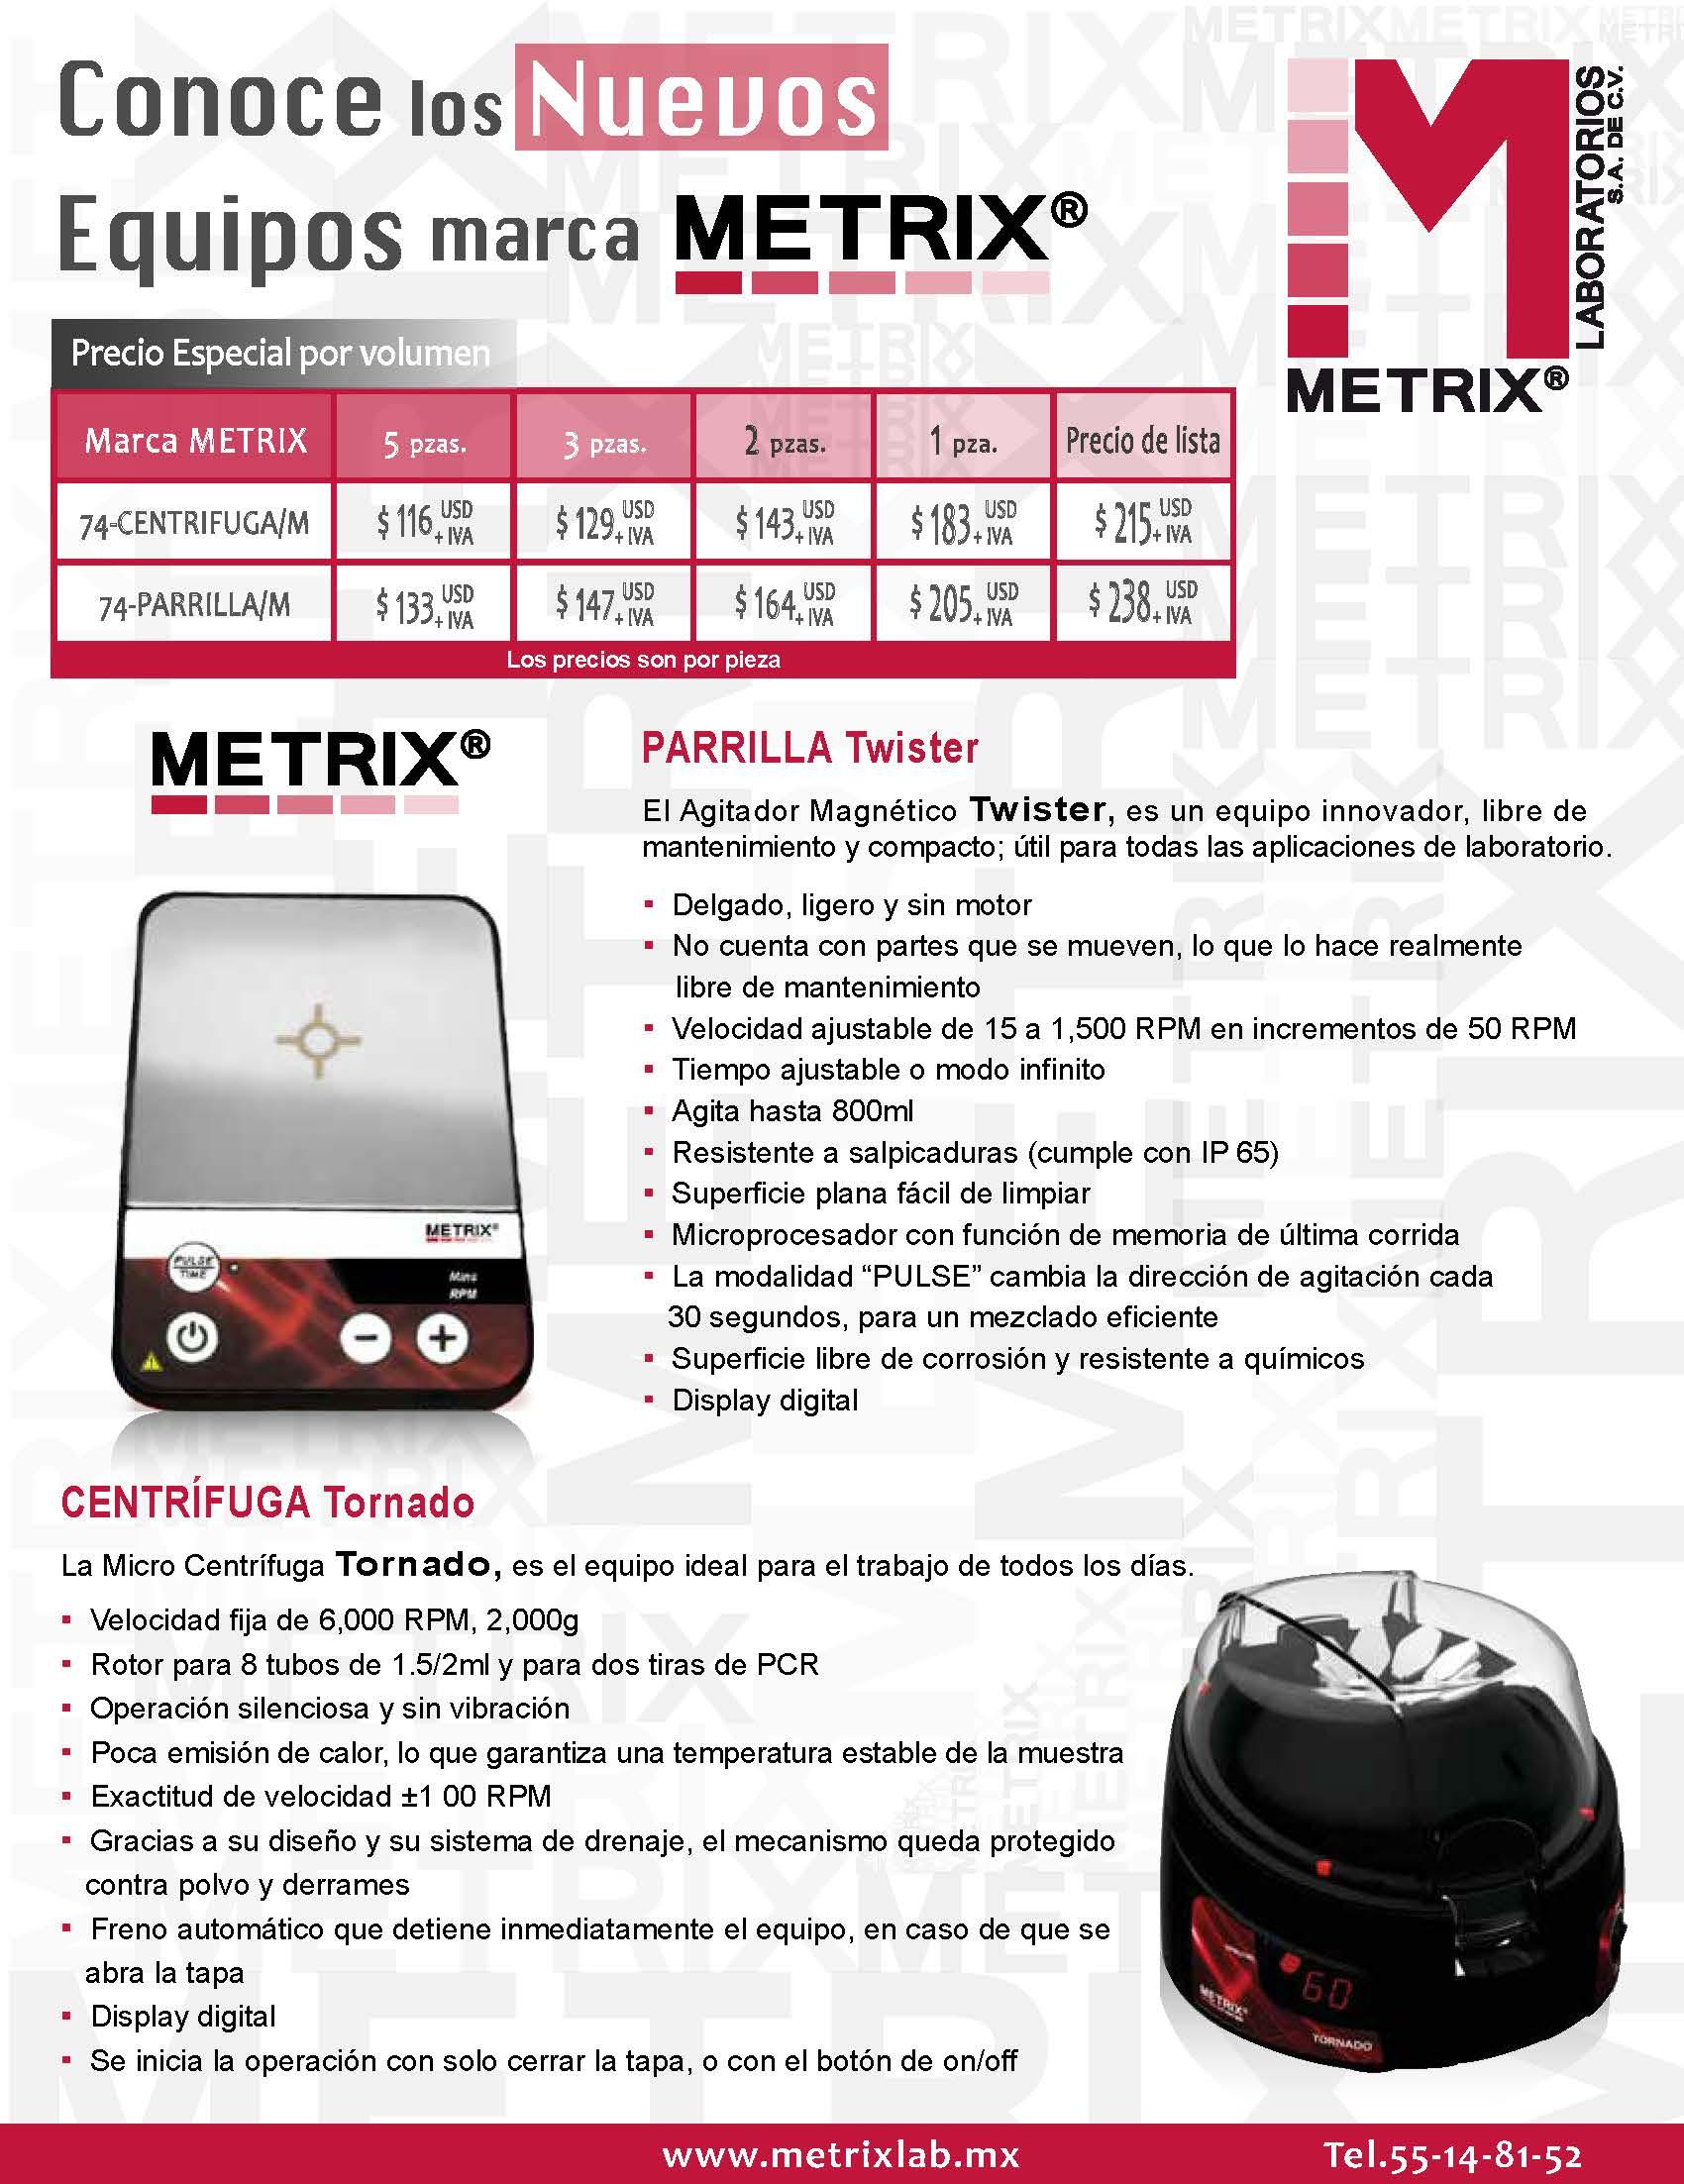 centrifuga-tornado-y-parrilla-twister-metrix2